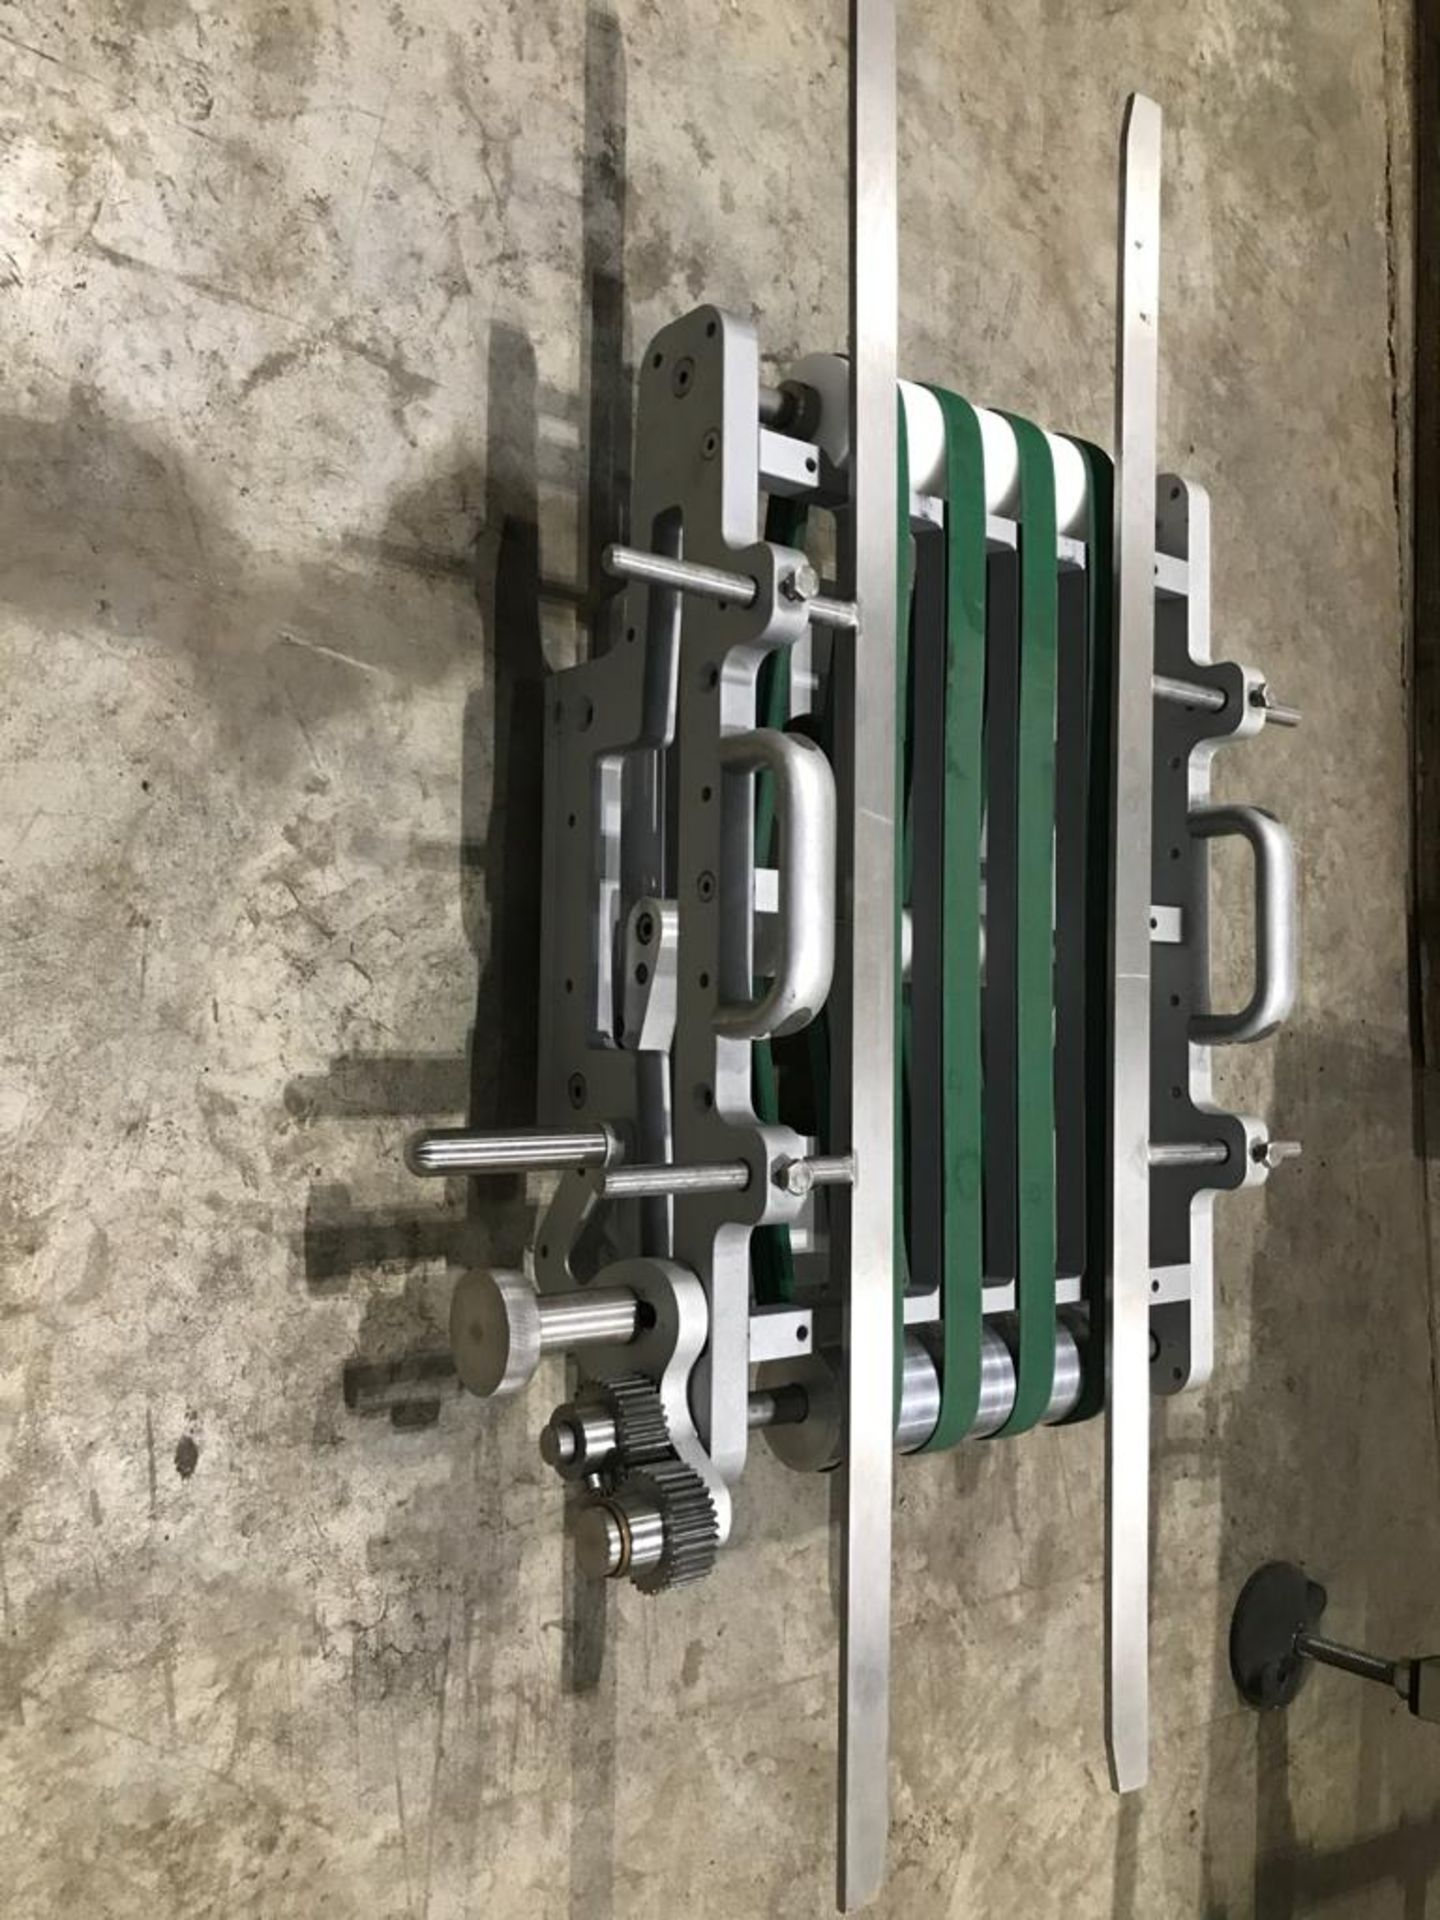 Lot 184 - Small coged conveyor